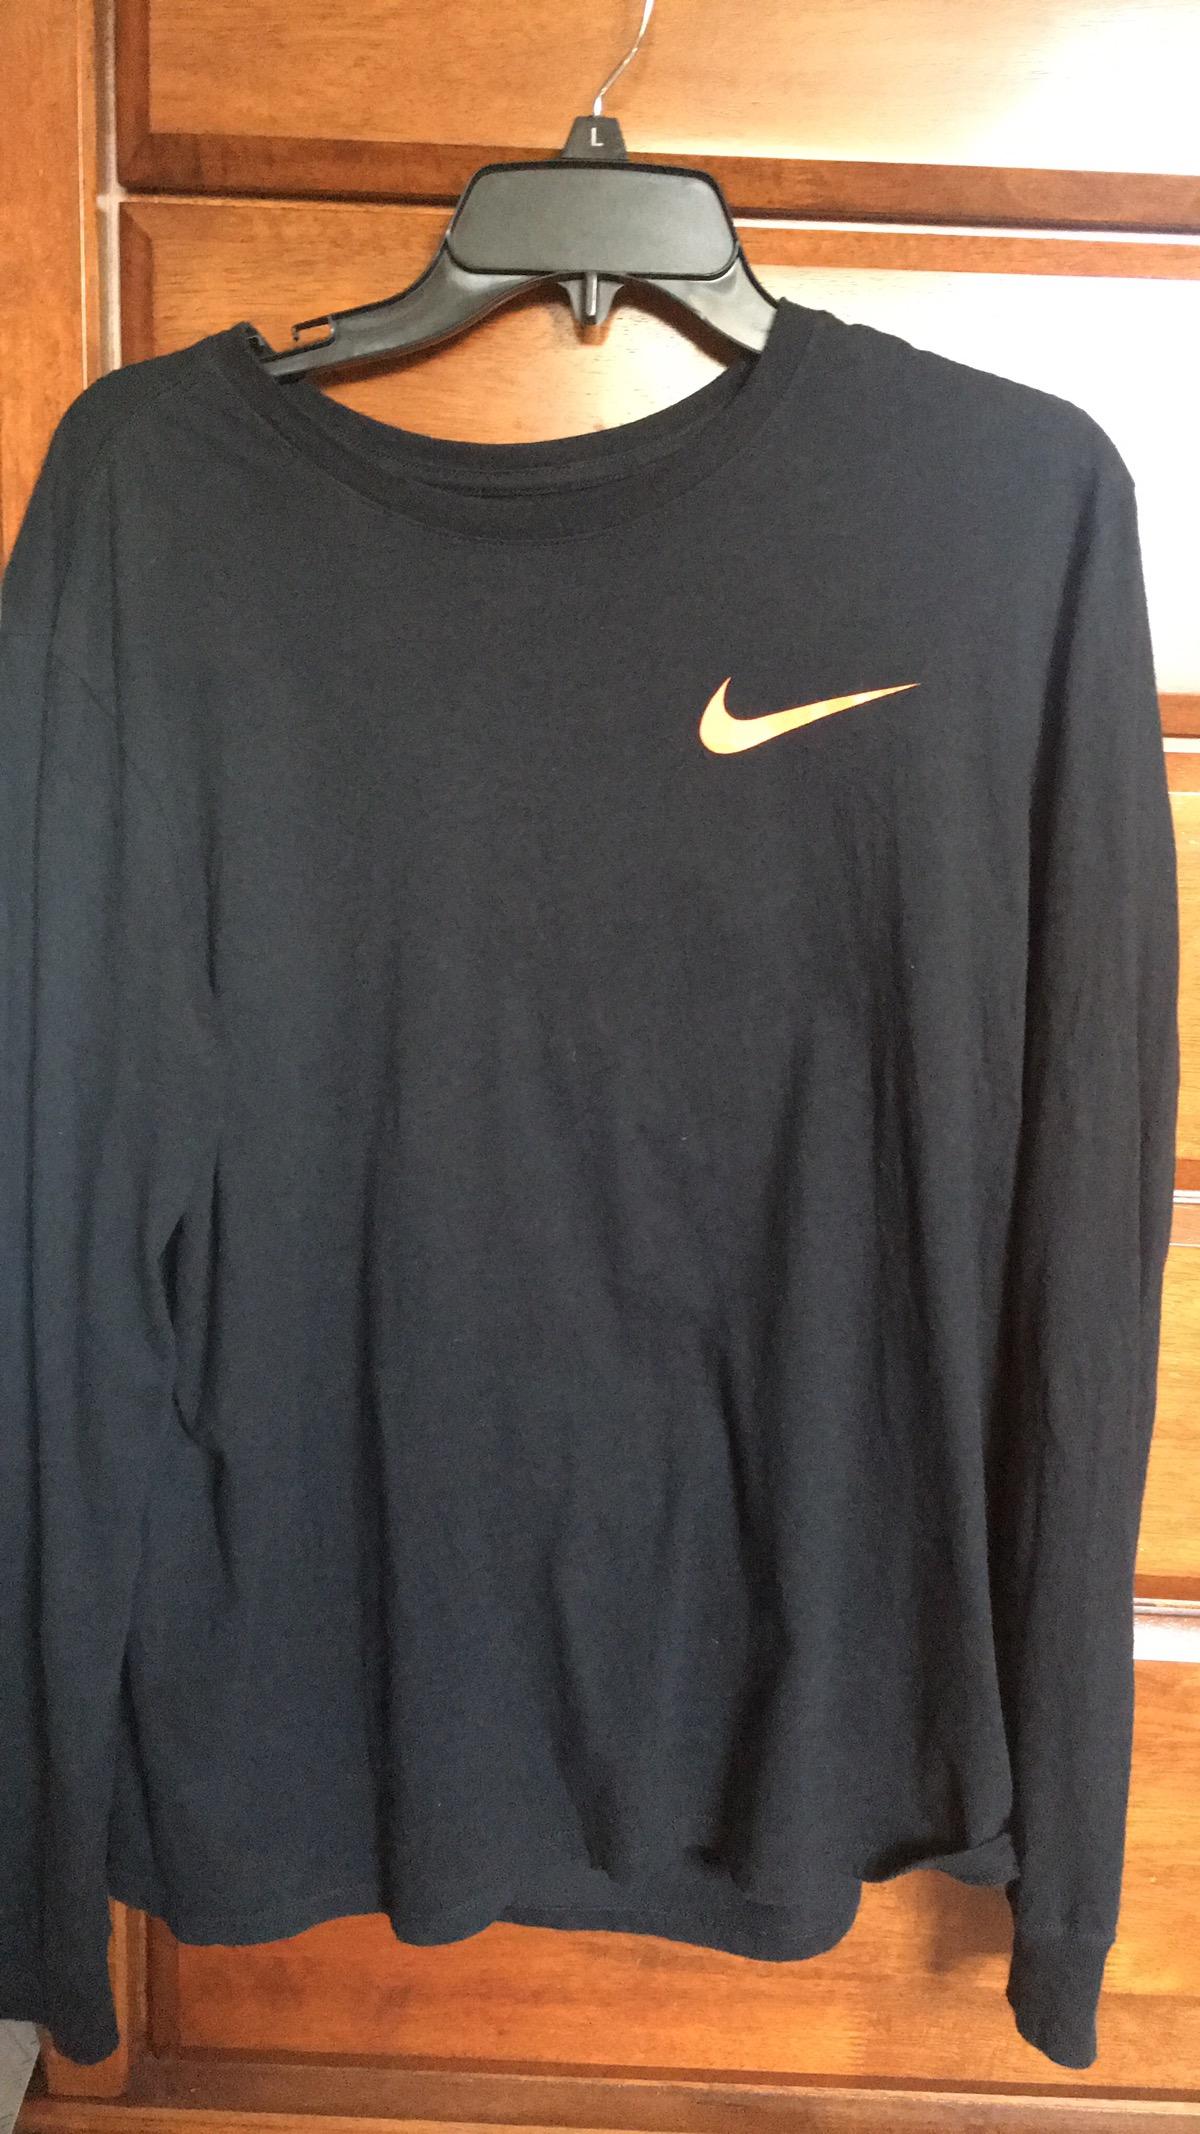 3aec3b1c Nike × Vlone ×. Vlone X Nike Complexcon Long Sleeve. Size: US L / EU 52-54  ...